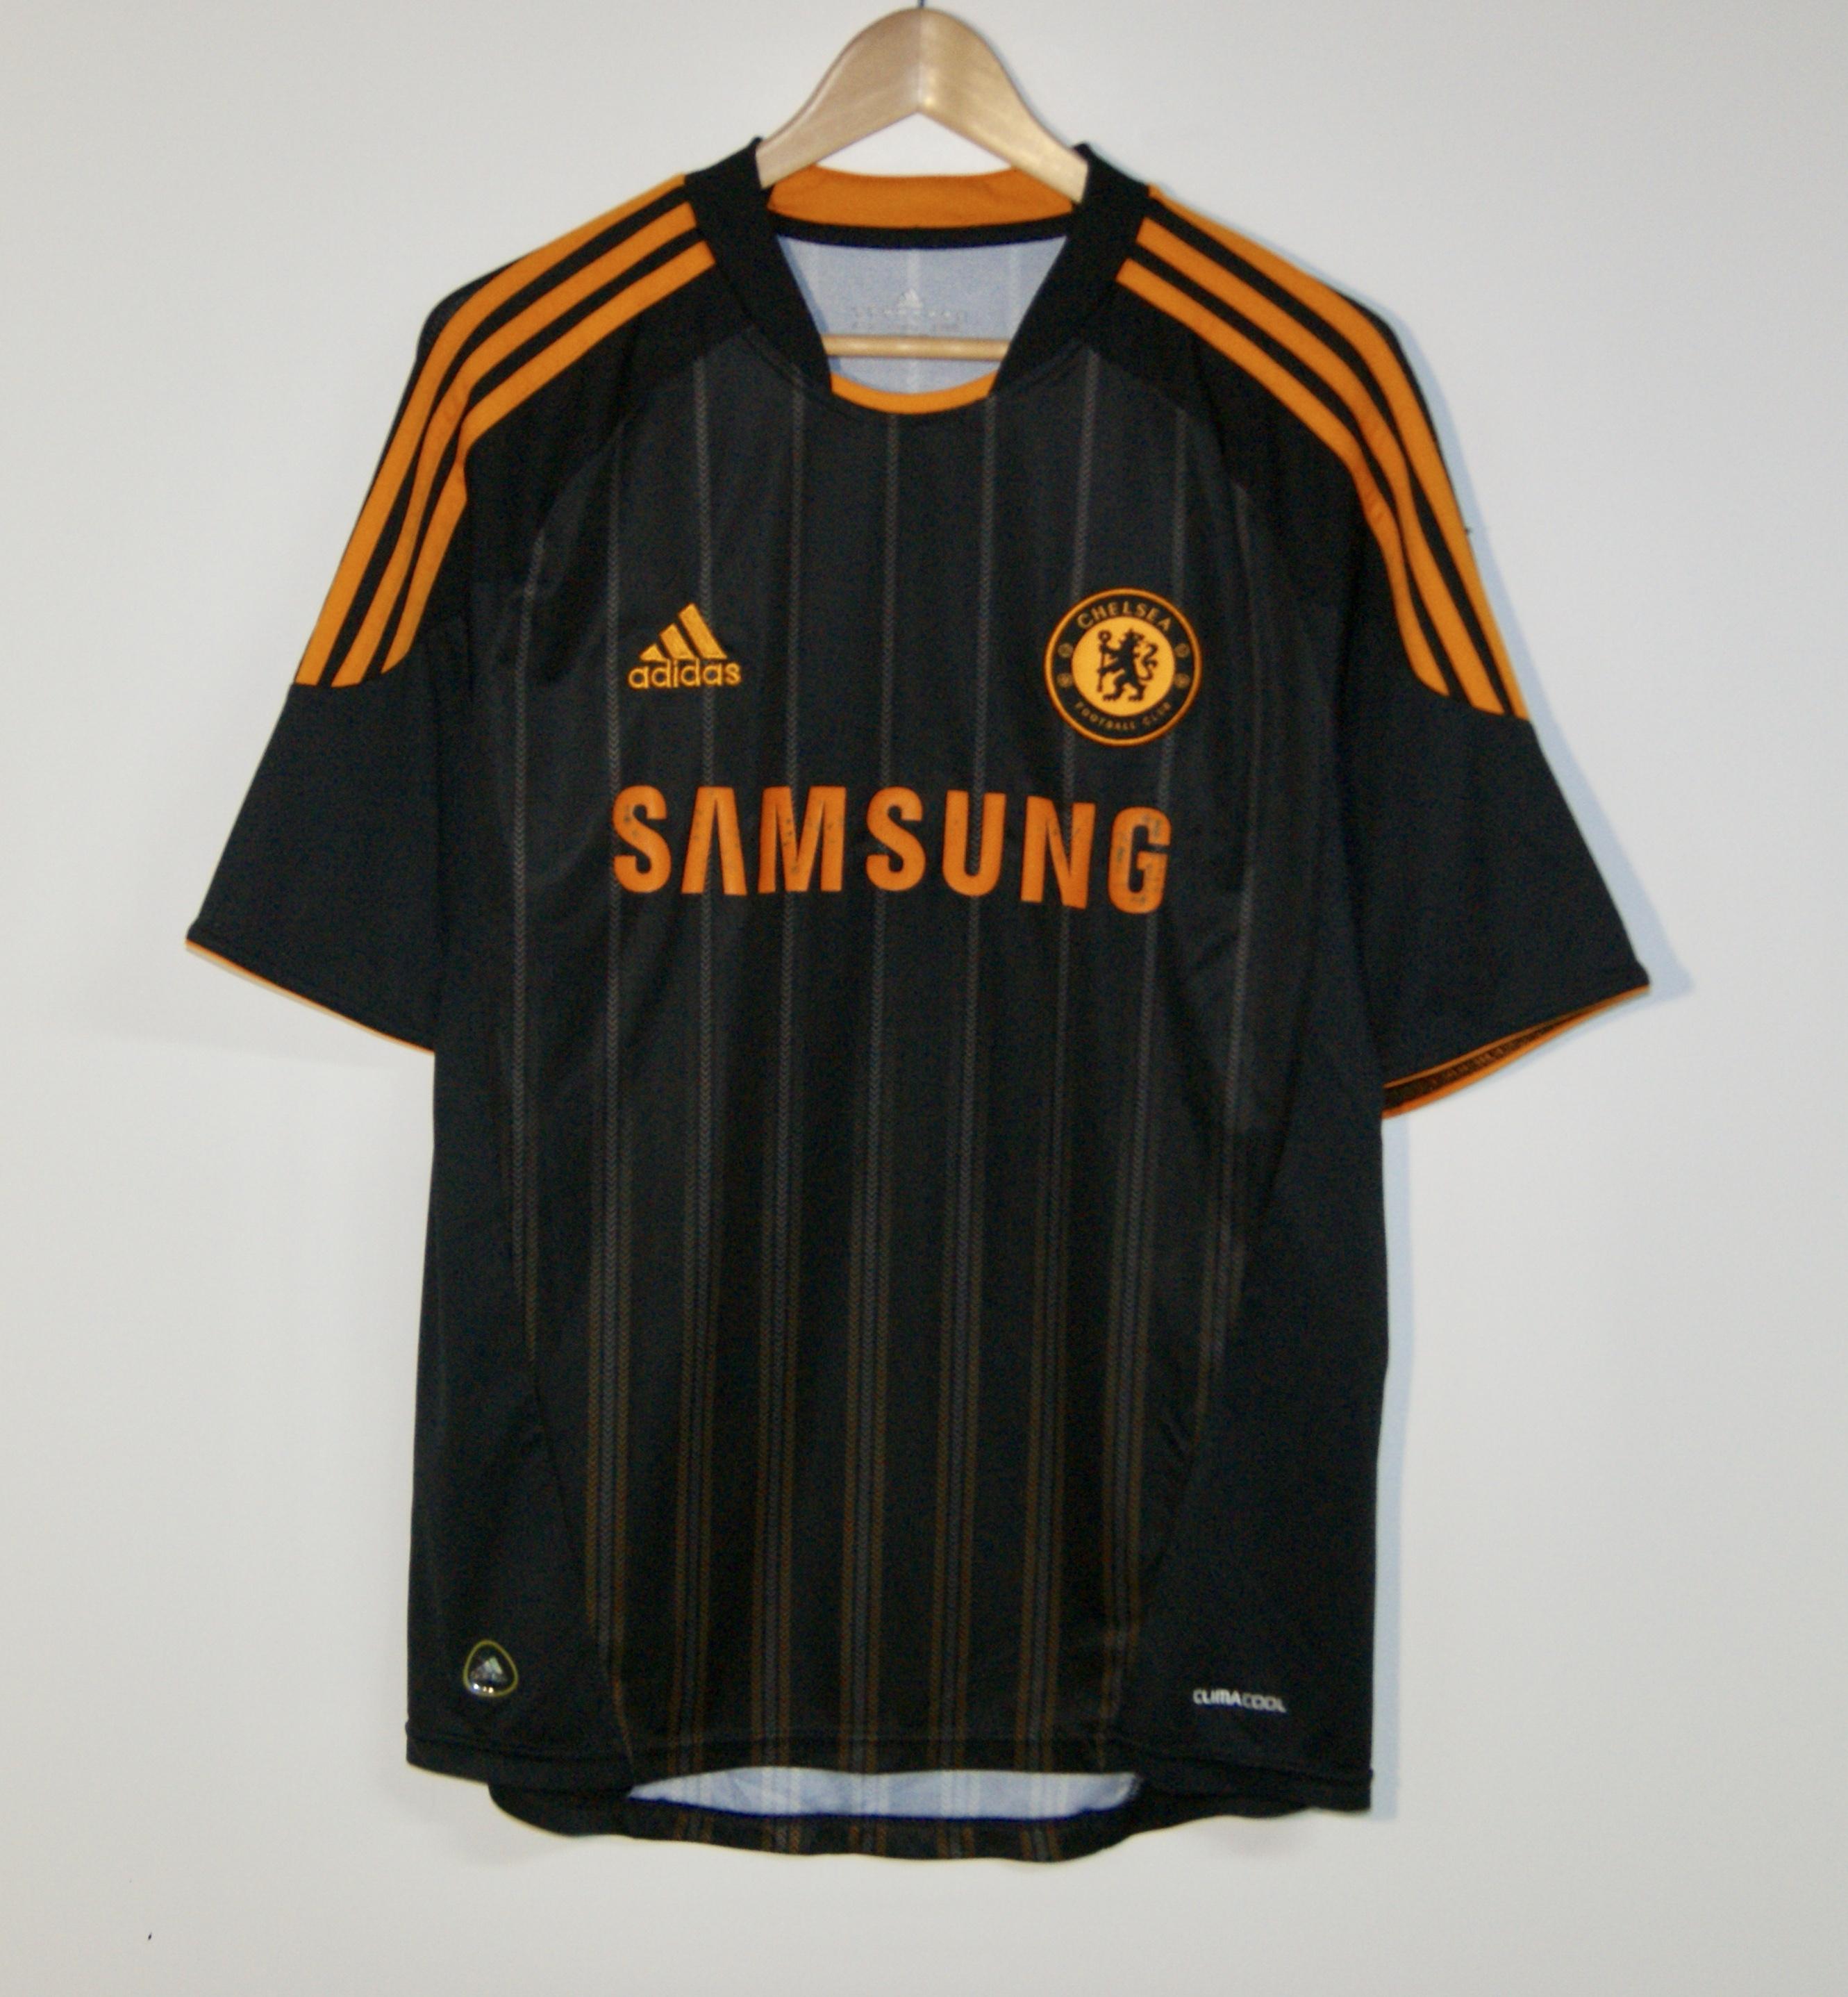 newest a810b 22508 Adidas-Drogba-CHELSEA-FC-Soccer-Football-Jersey